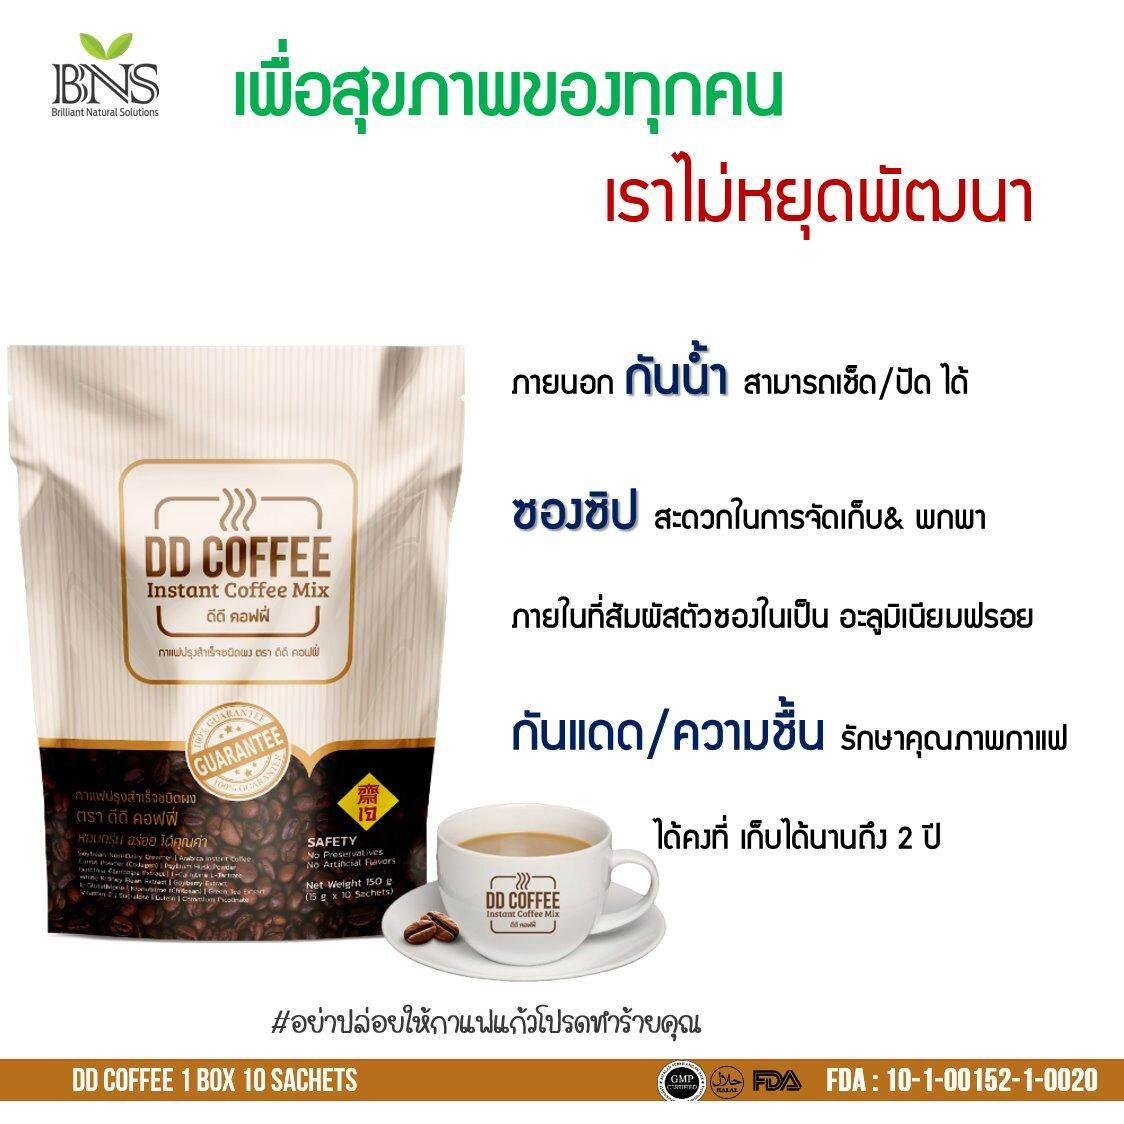 Dd Coffee กาแฟสุขภาพ และควบคุมน้ำหนัก เผาผลาญ กระชับสัดส่วน รักษาสมดุลของระบบขับถ่าย ลดไขมันสะสม ผิวพรรณกระชับ สดใส Coffee Instant 15 In 1 2 กล่อง ใน กรุงเทพมหานคร